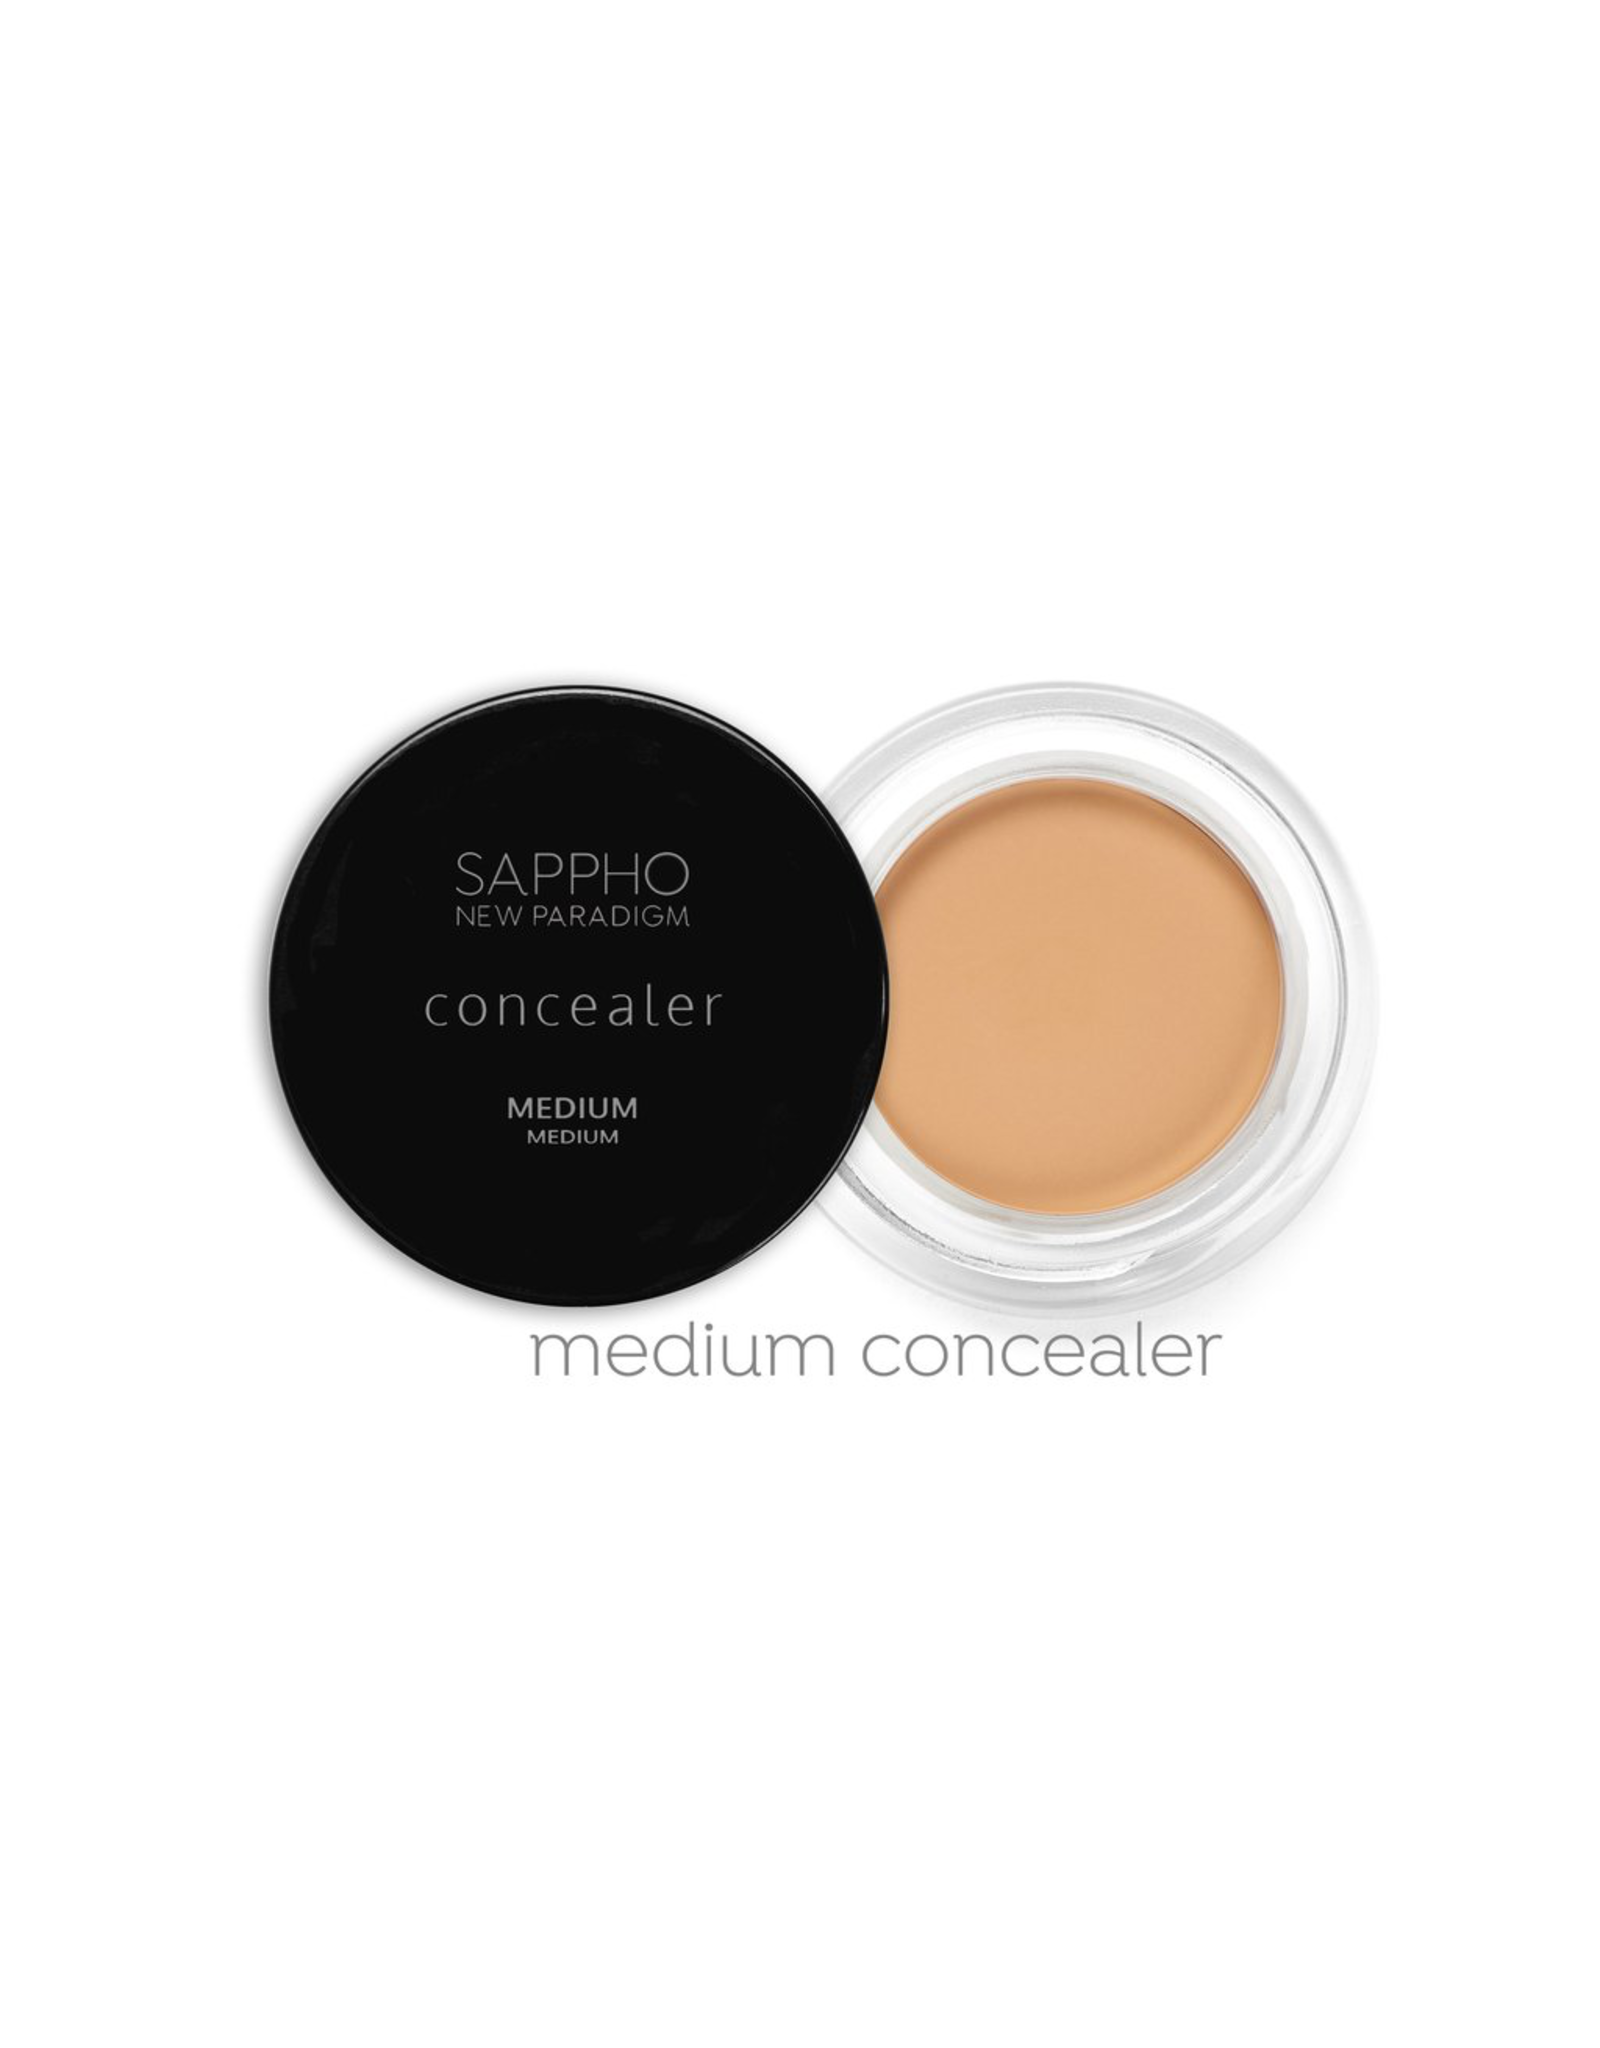 SAPPHO Concealer - Medium